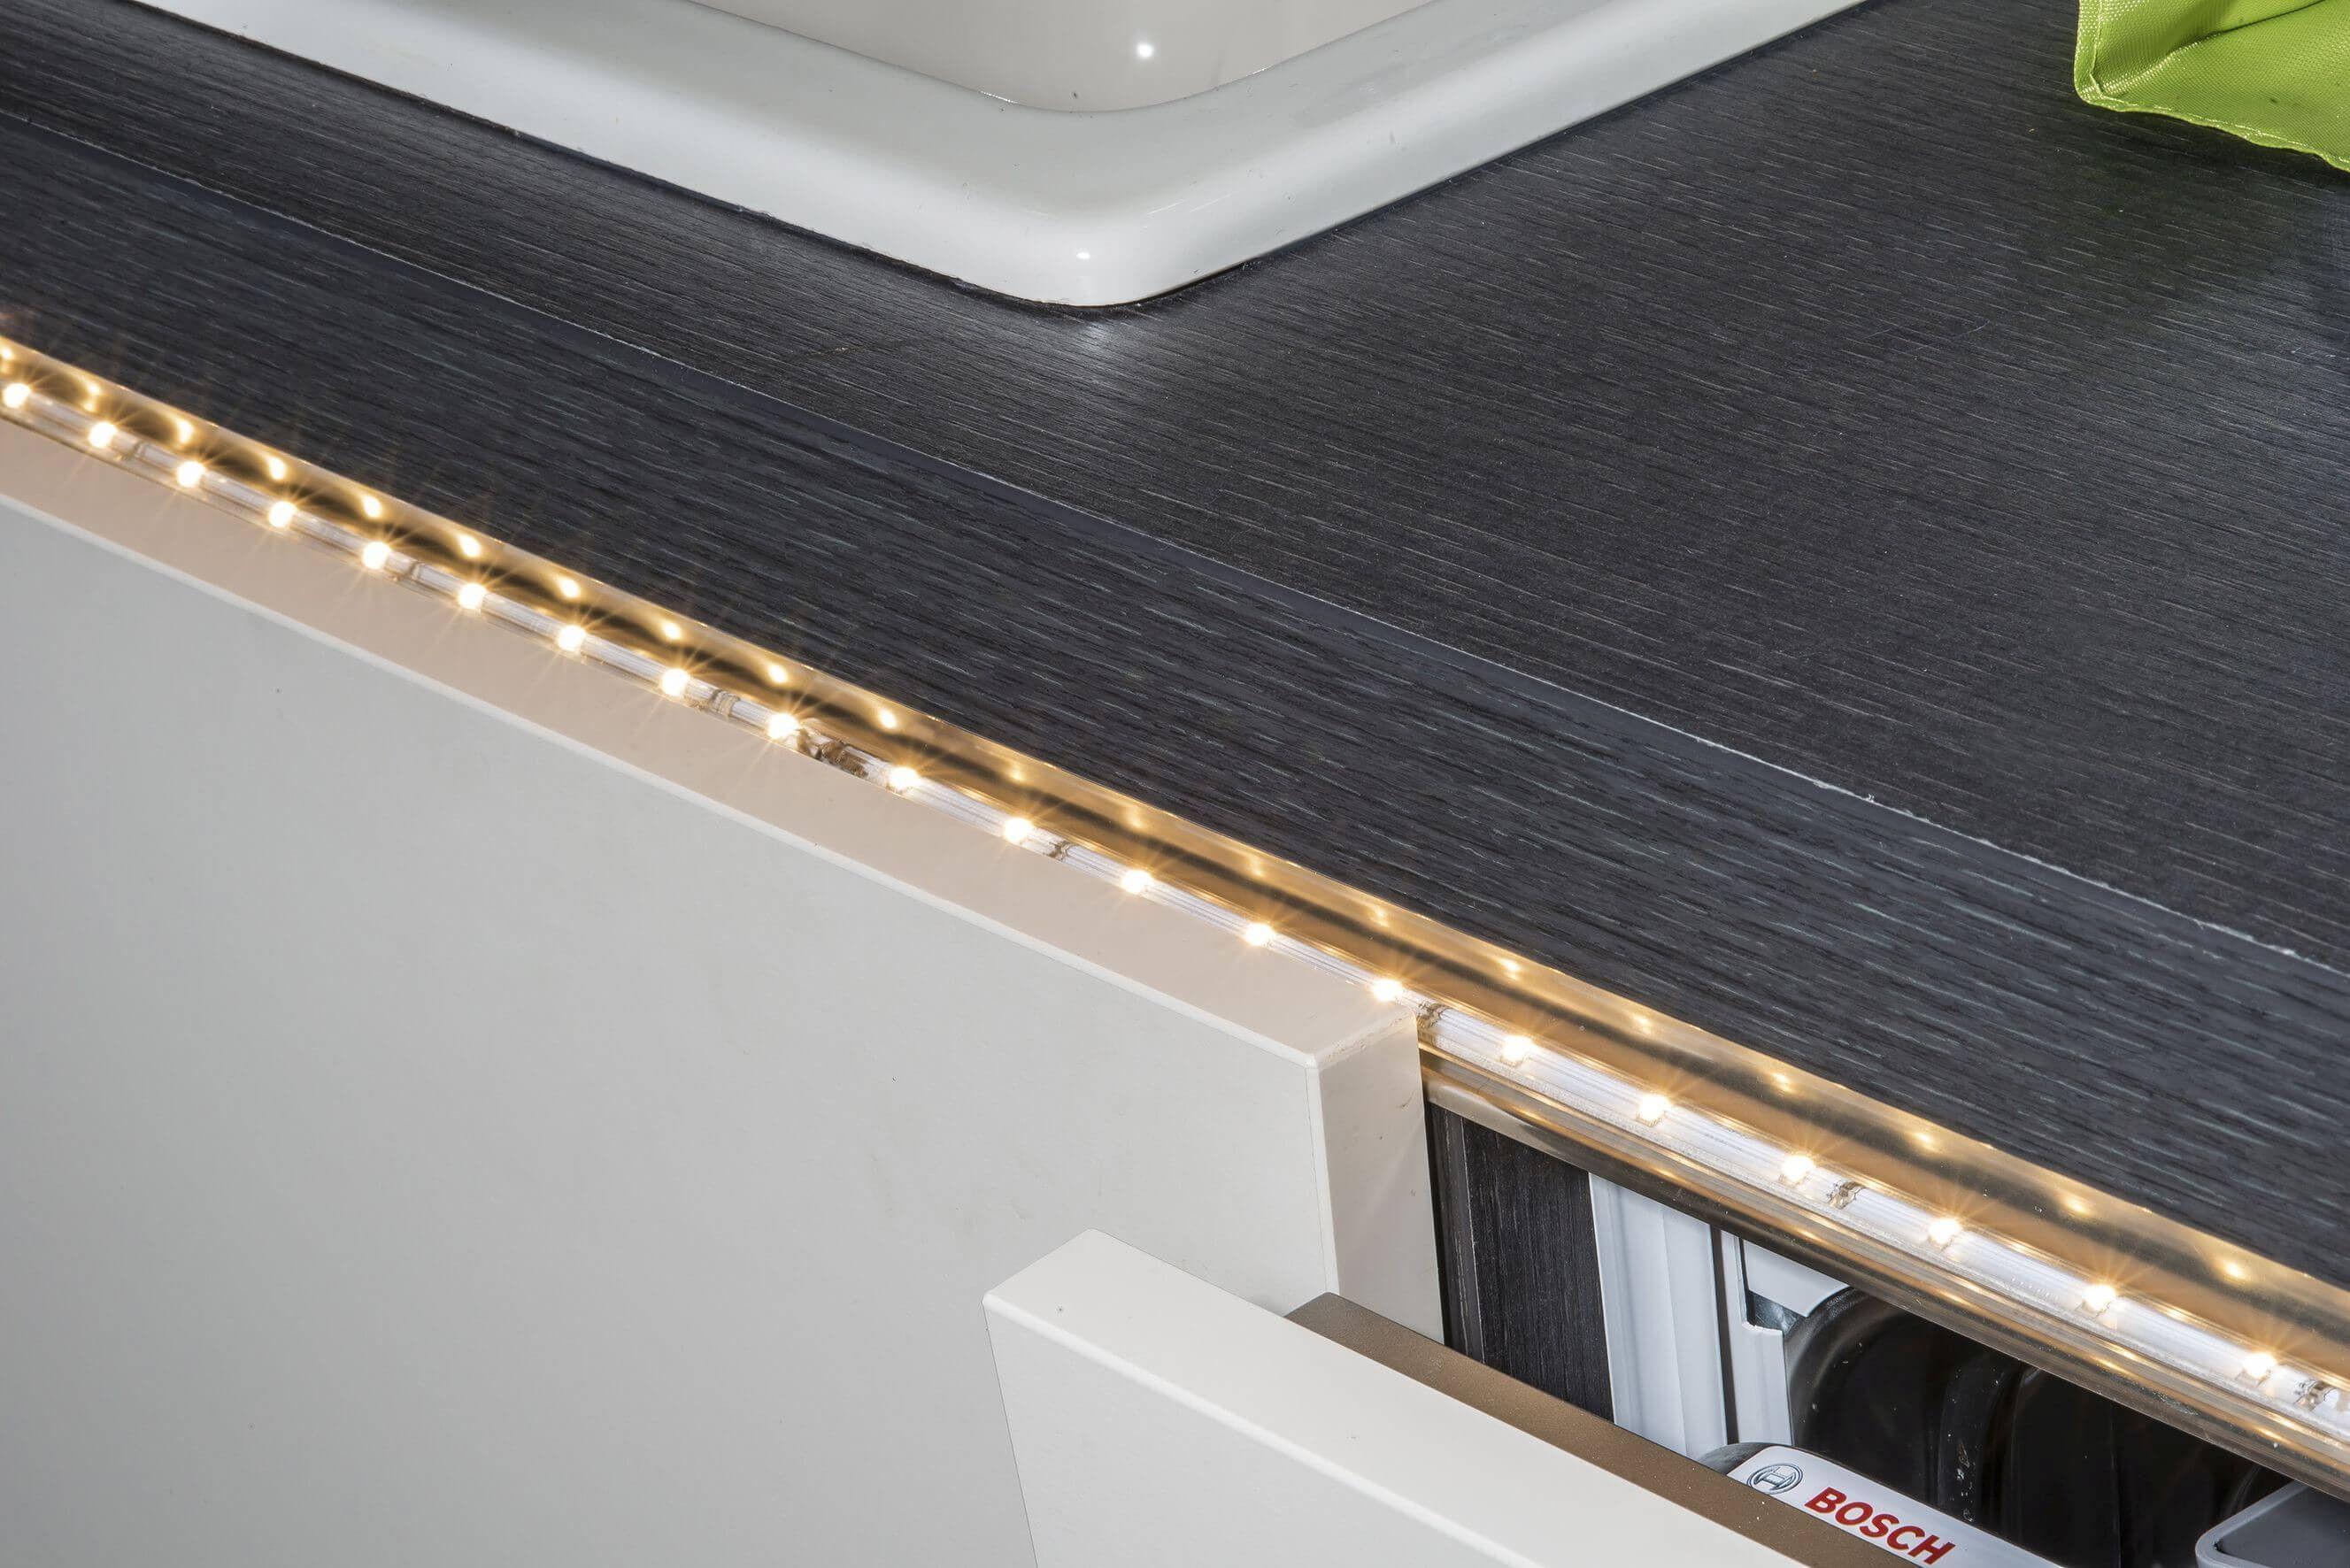 Led Schiene 3er Set Led Stripes Fur Indirekte Beleuchtung Unter Vorsprungen In Kuche Bad Oder Wohnzimmer Led Schiene Led Led Stripes